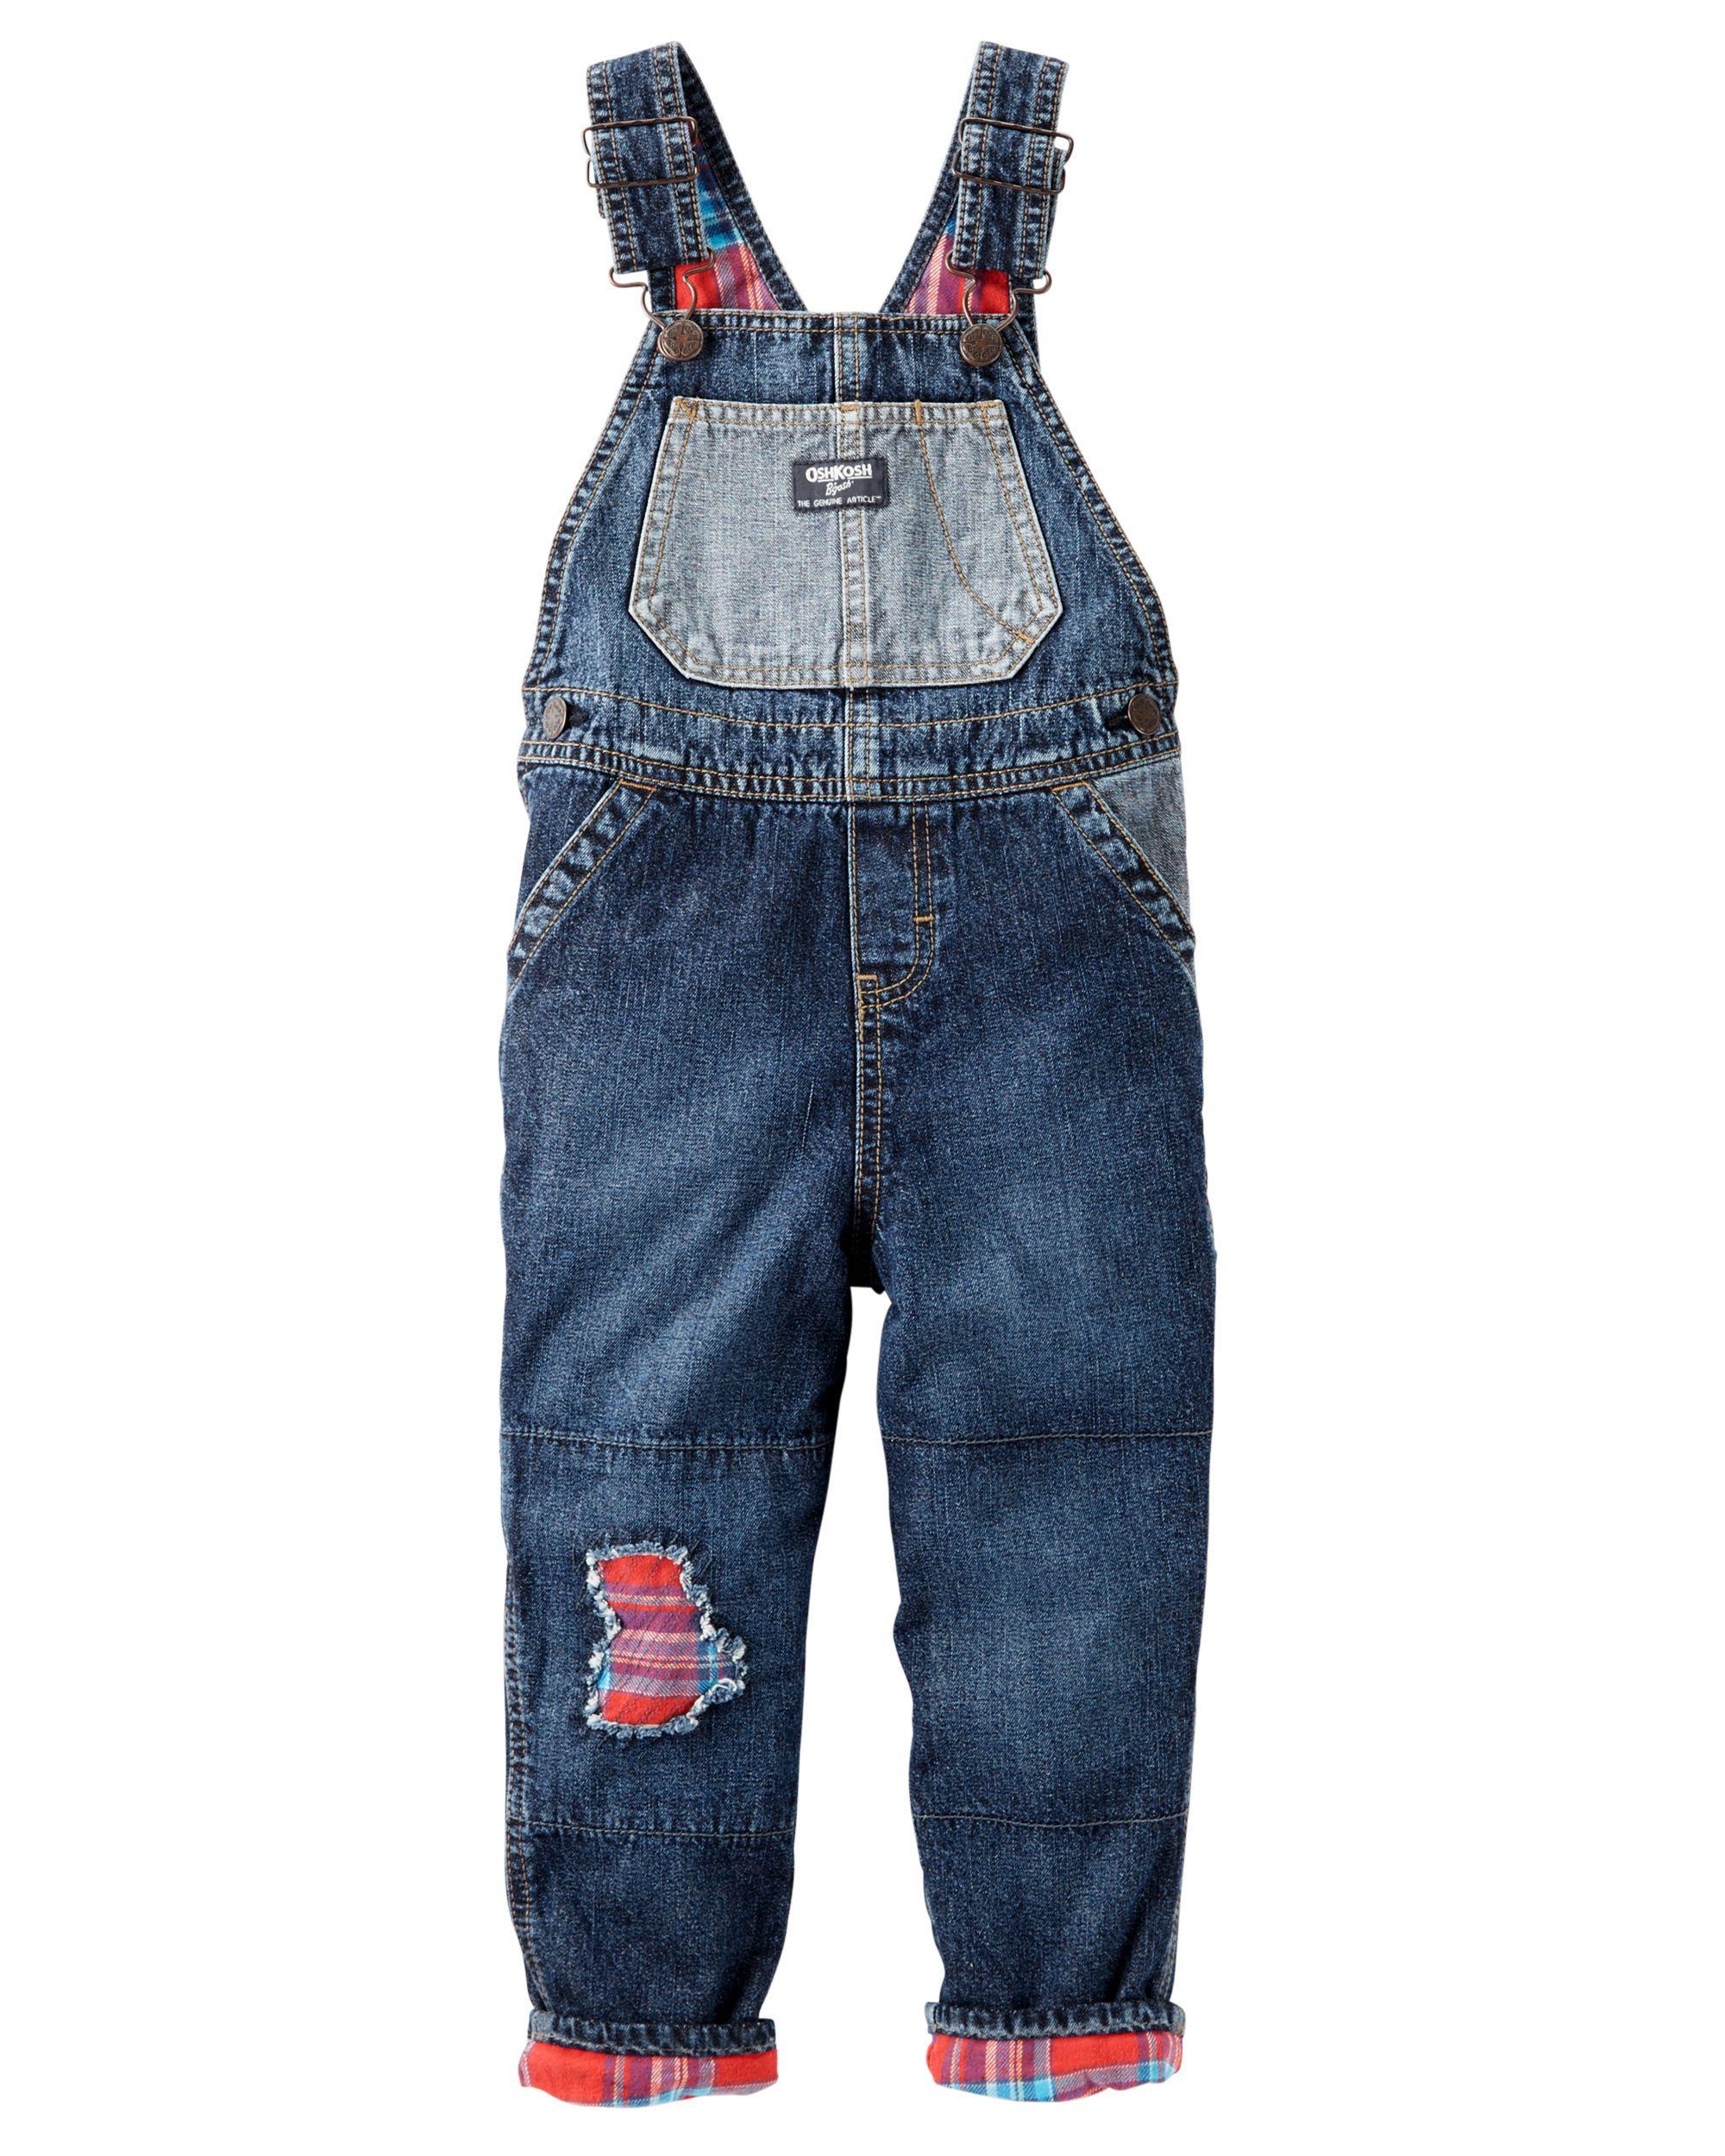 50c20bfb1 Toddler Boy Flannel-Lined Rip-&-Repair Denim Overalls | OshKosh.com ...